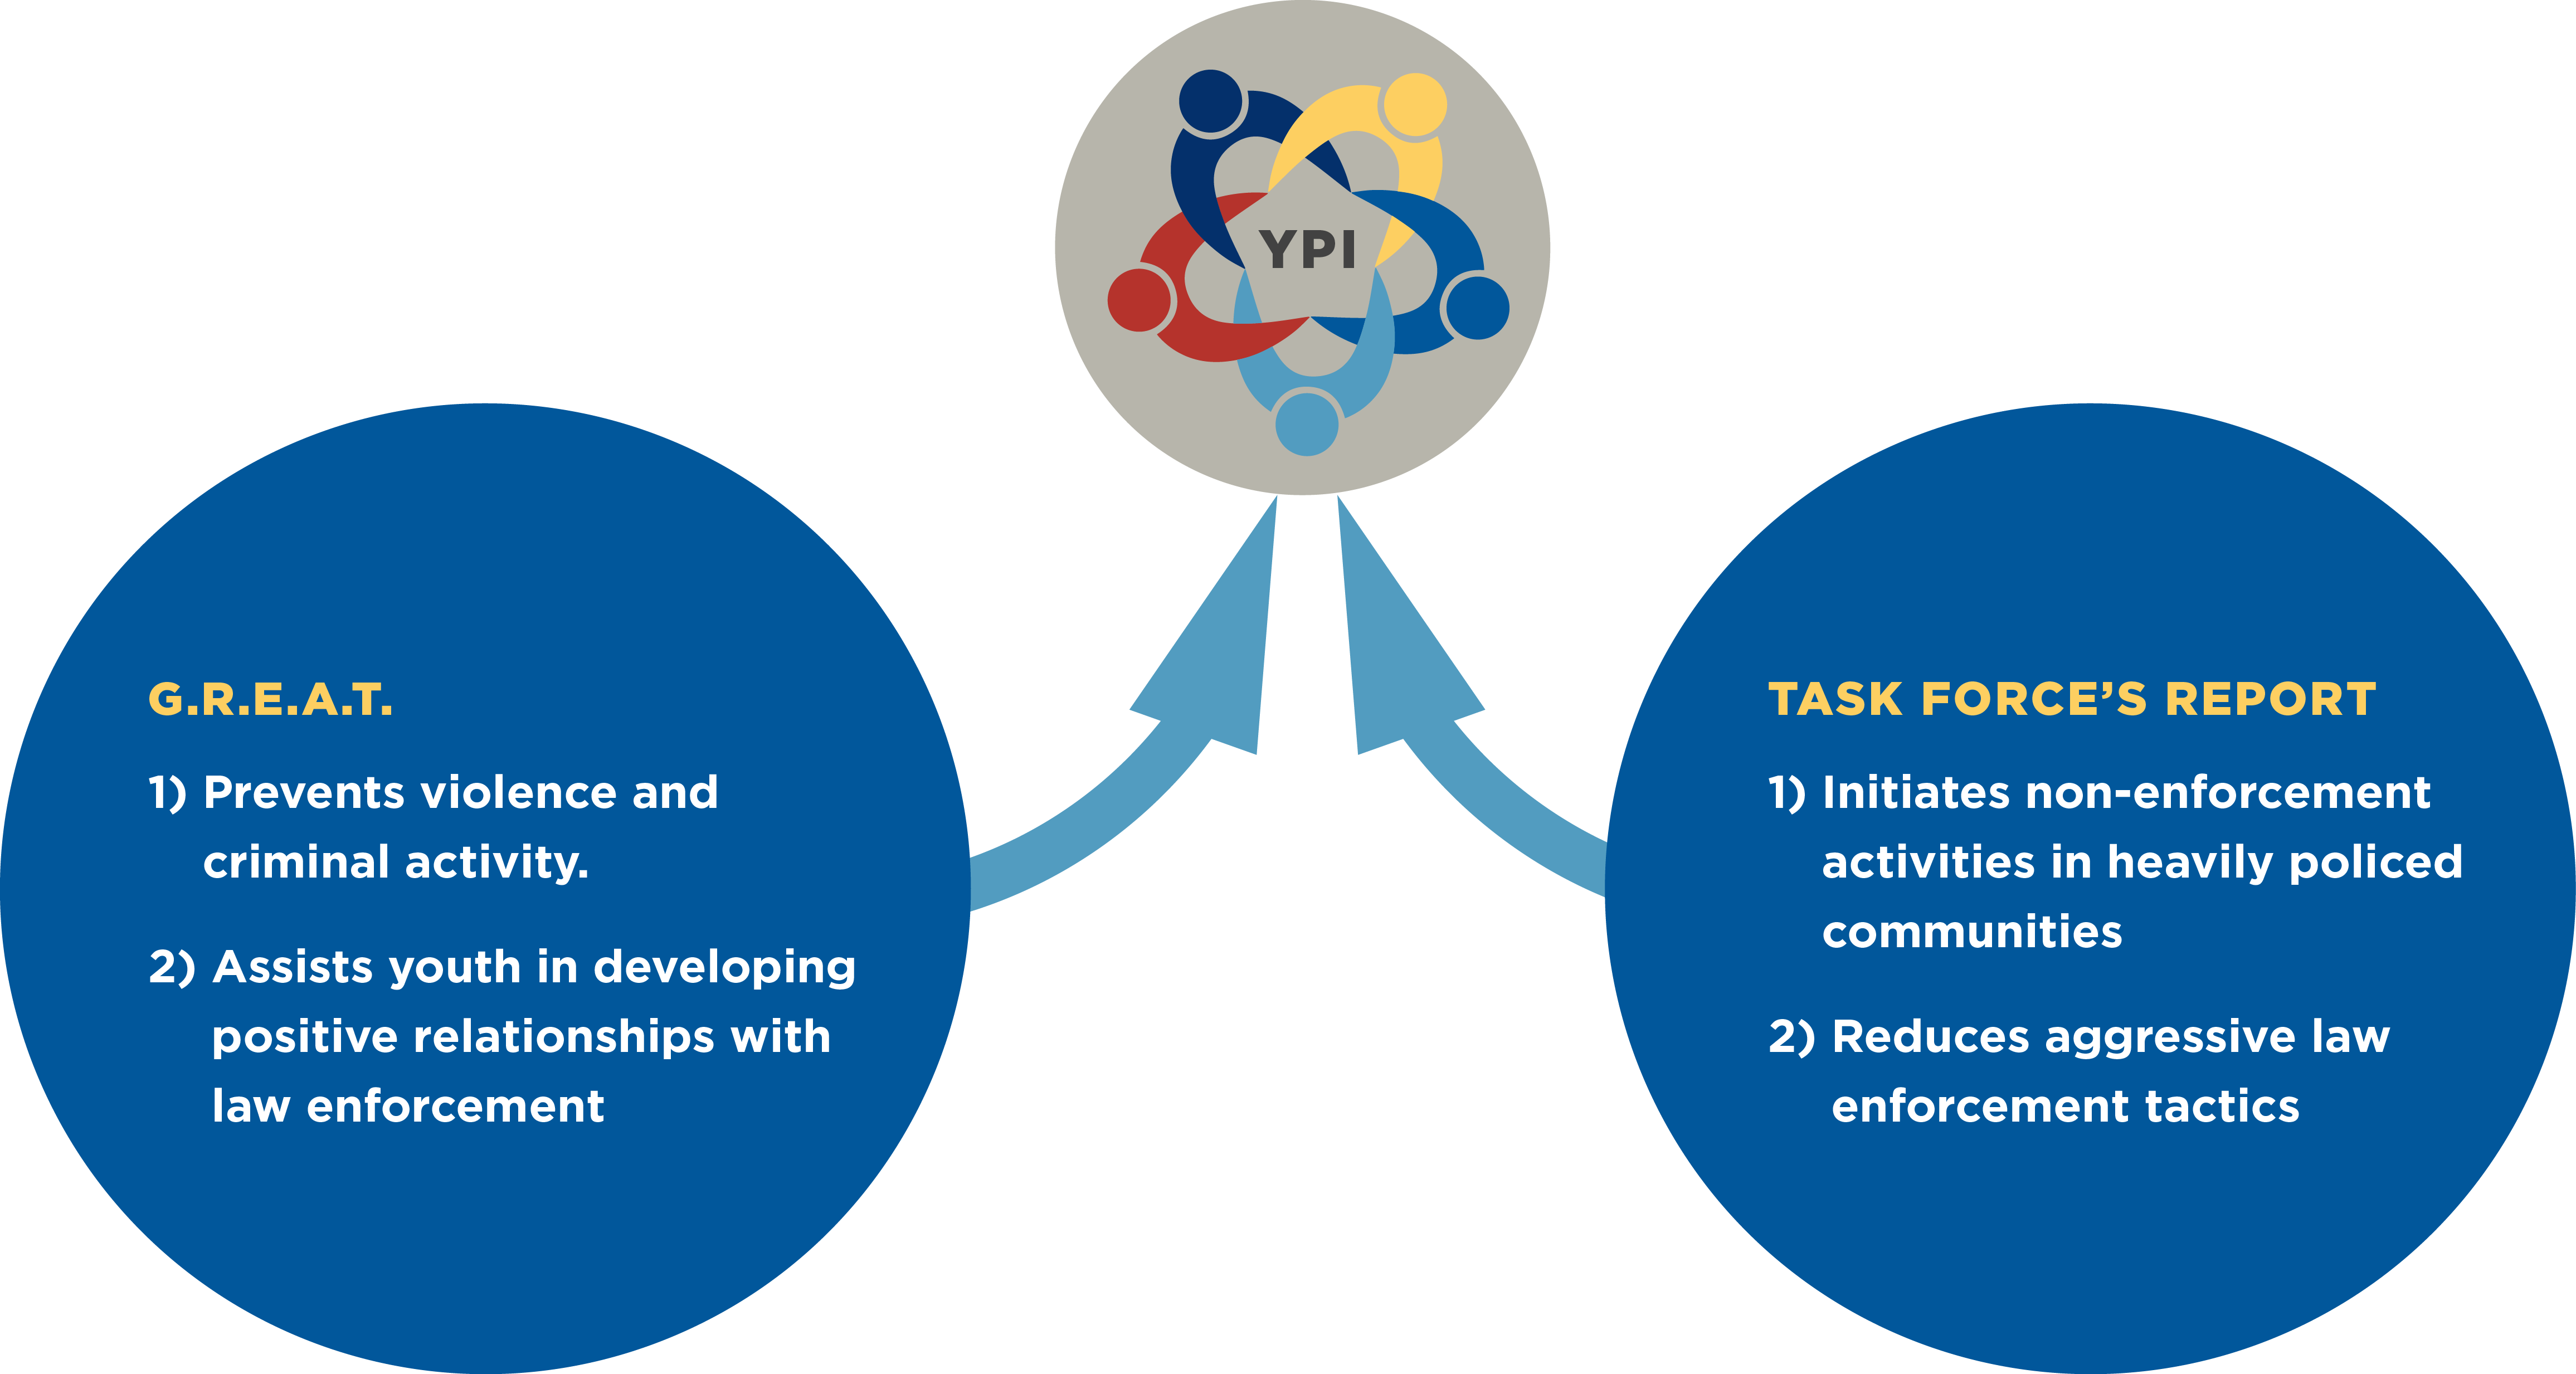 YPI evidence based practice diagram